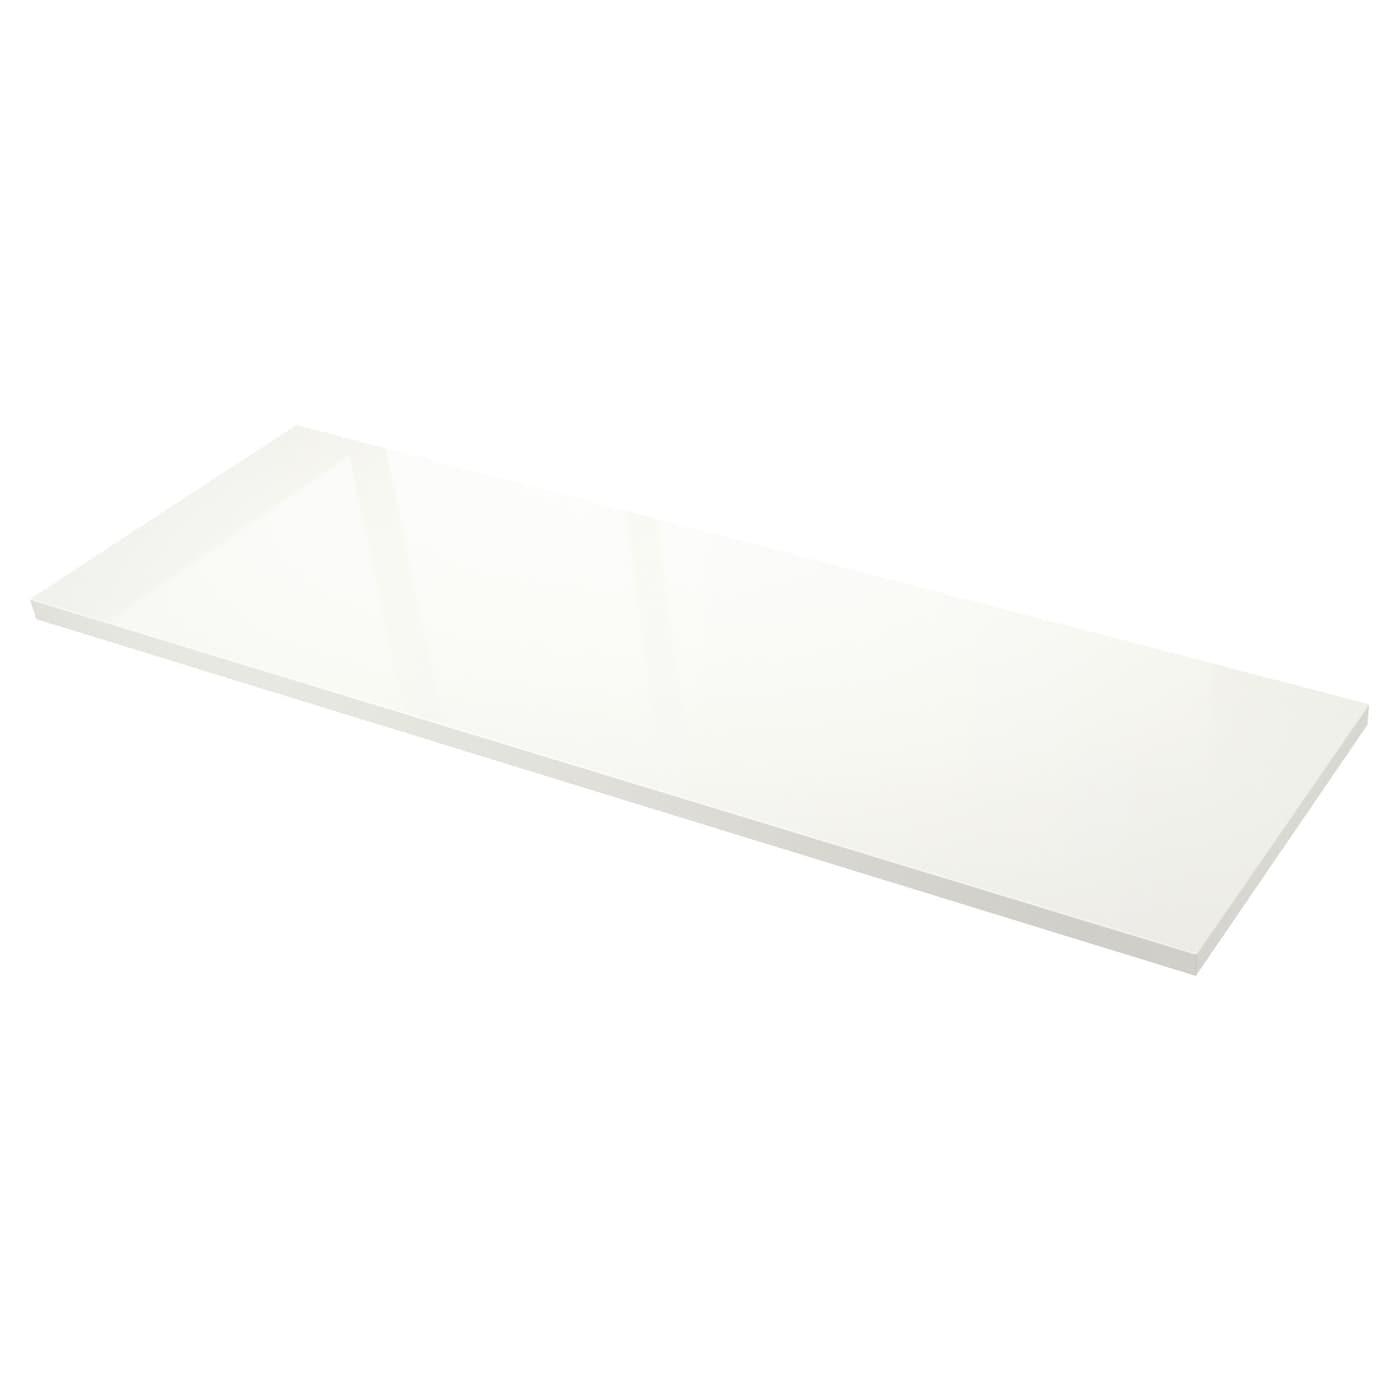 s ljan plan de travail sur mesure blanc brillant stratifi 63 6 125x3 8 cm ikea. Black Bedroom Furniture Sets. Home Design Ideas